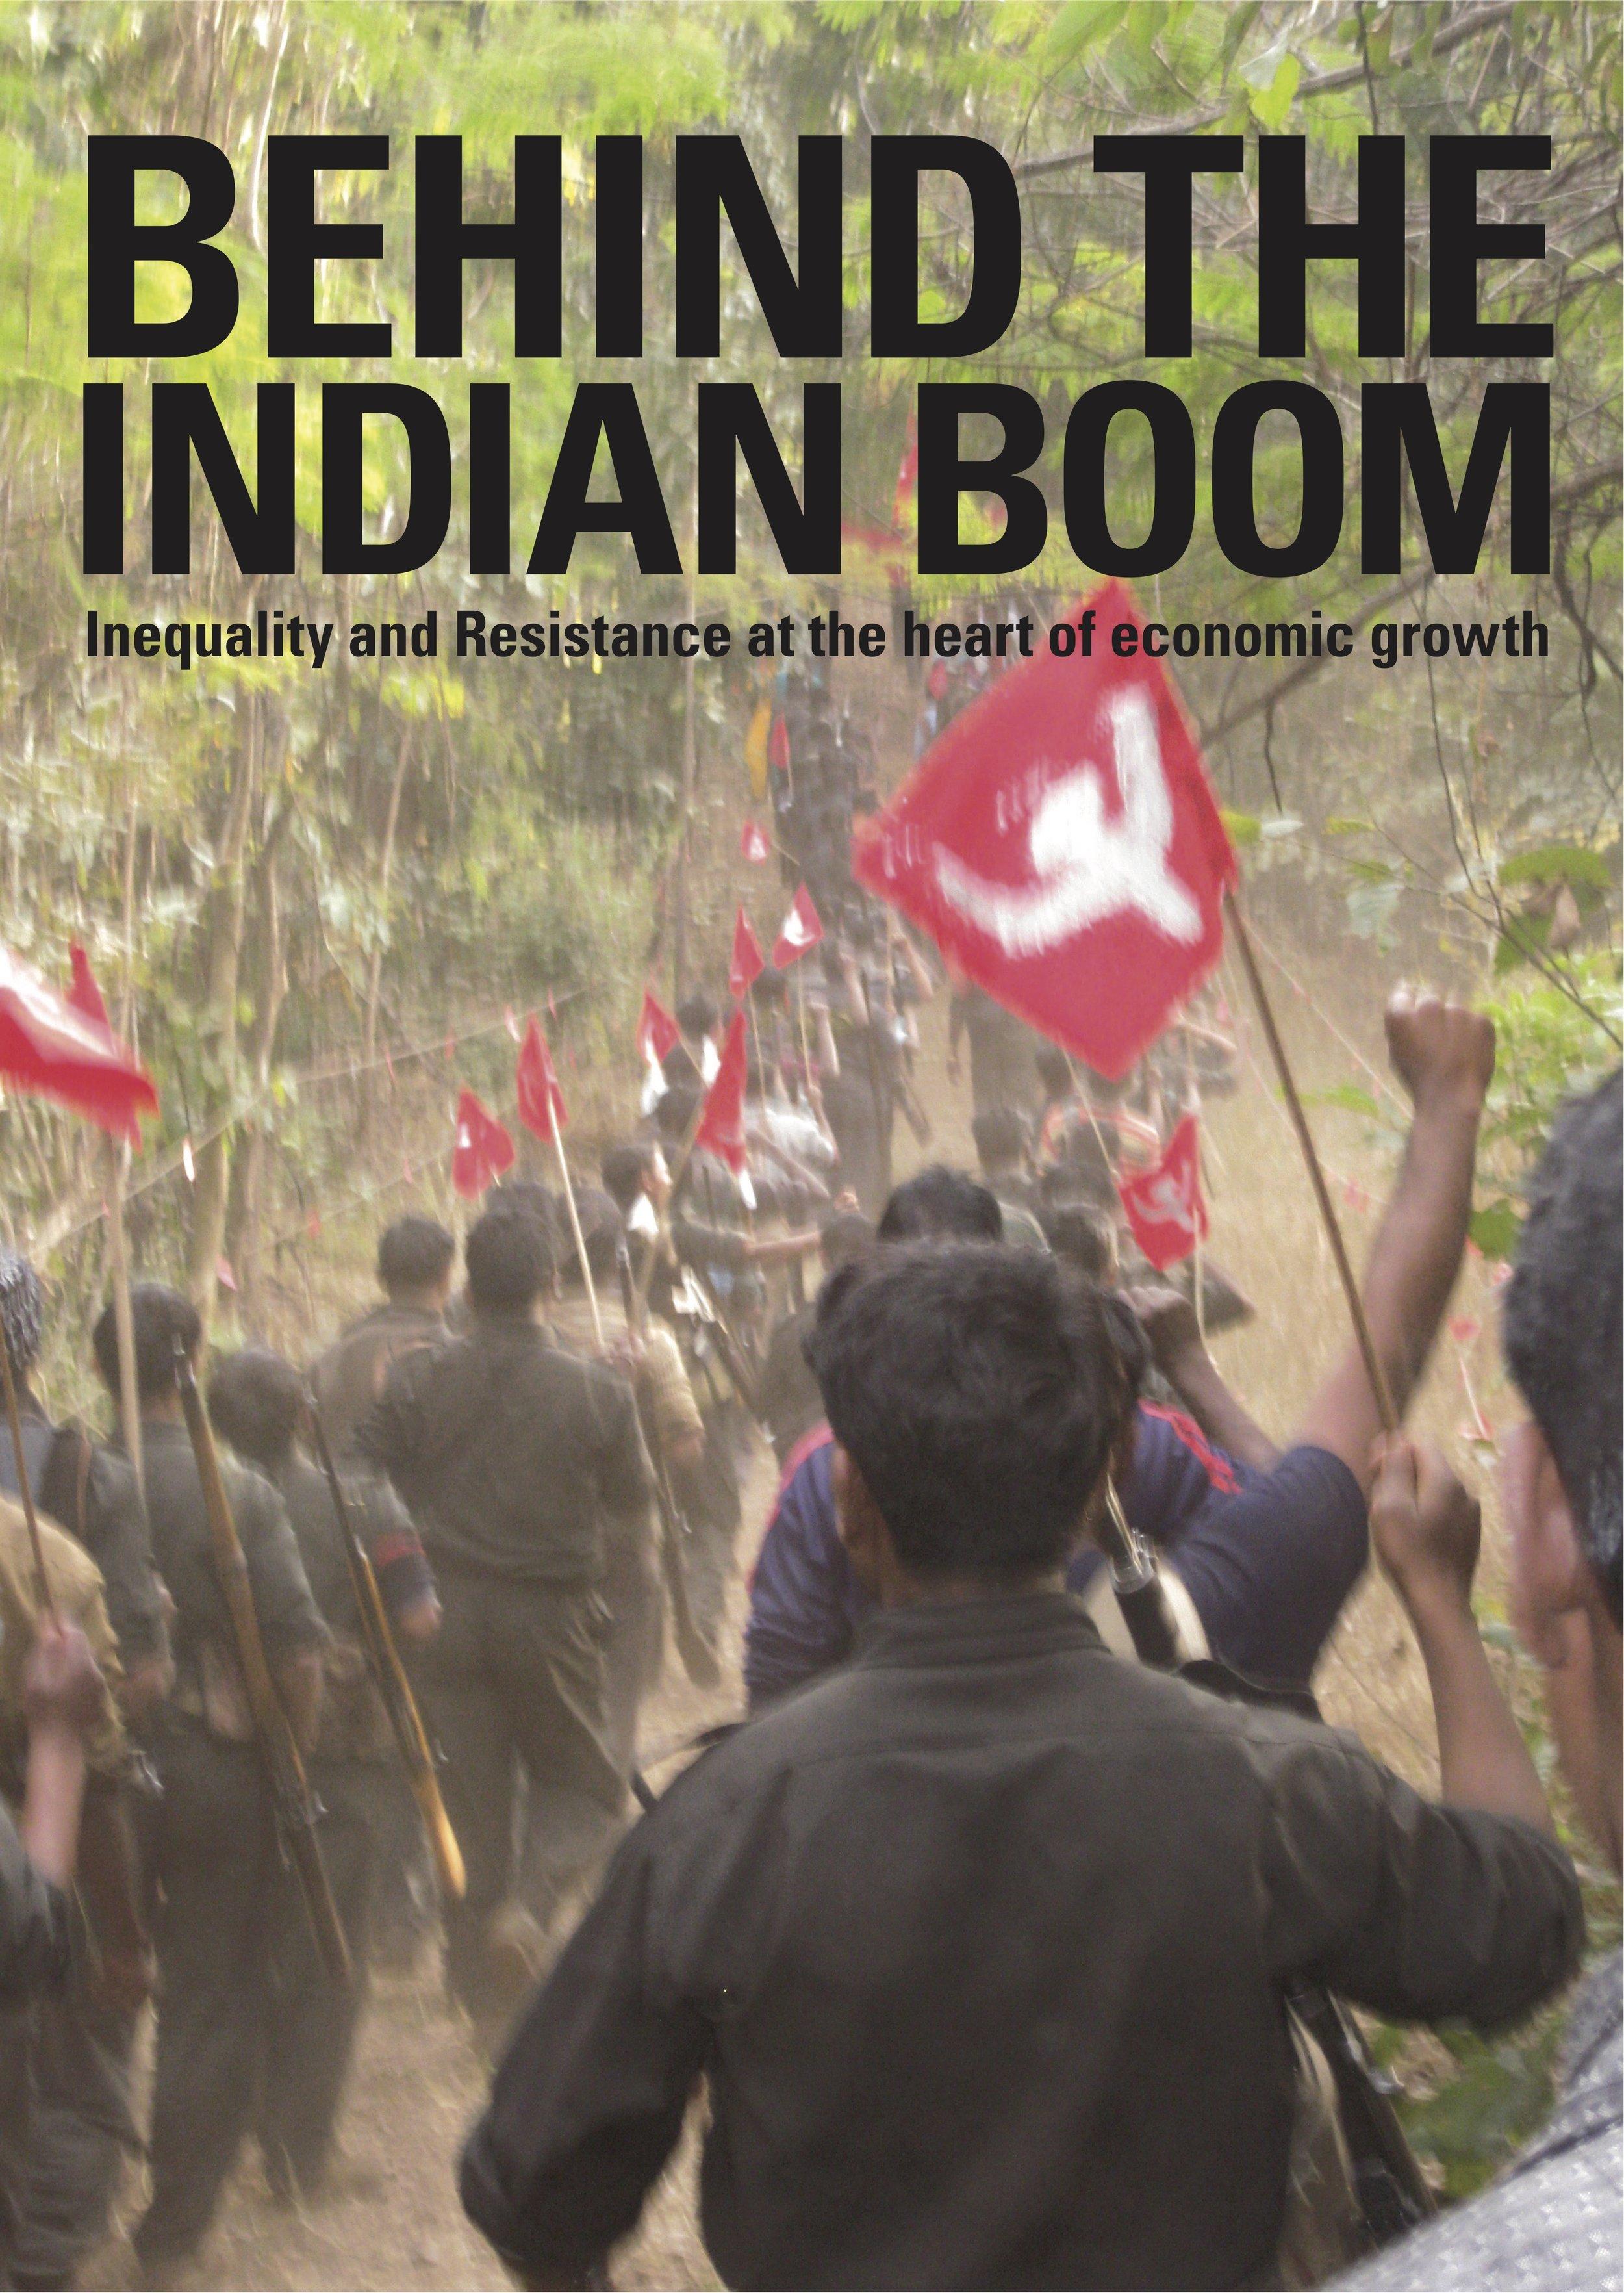 Banner of Indian Boom - Maoist.jpg